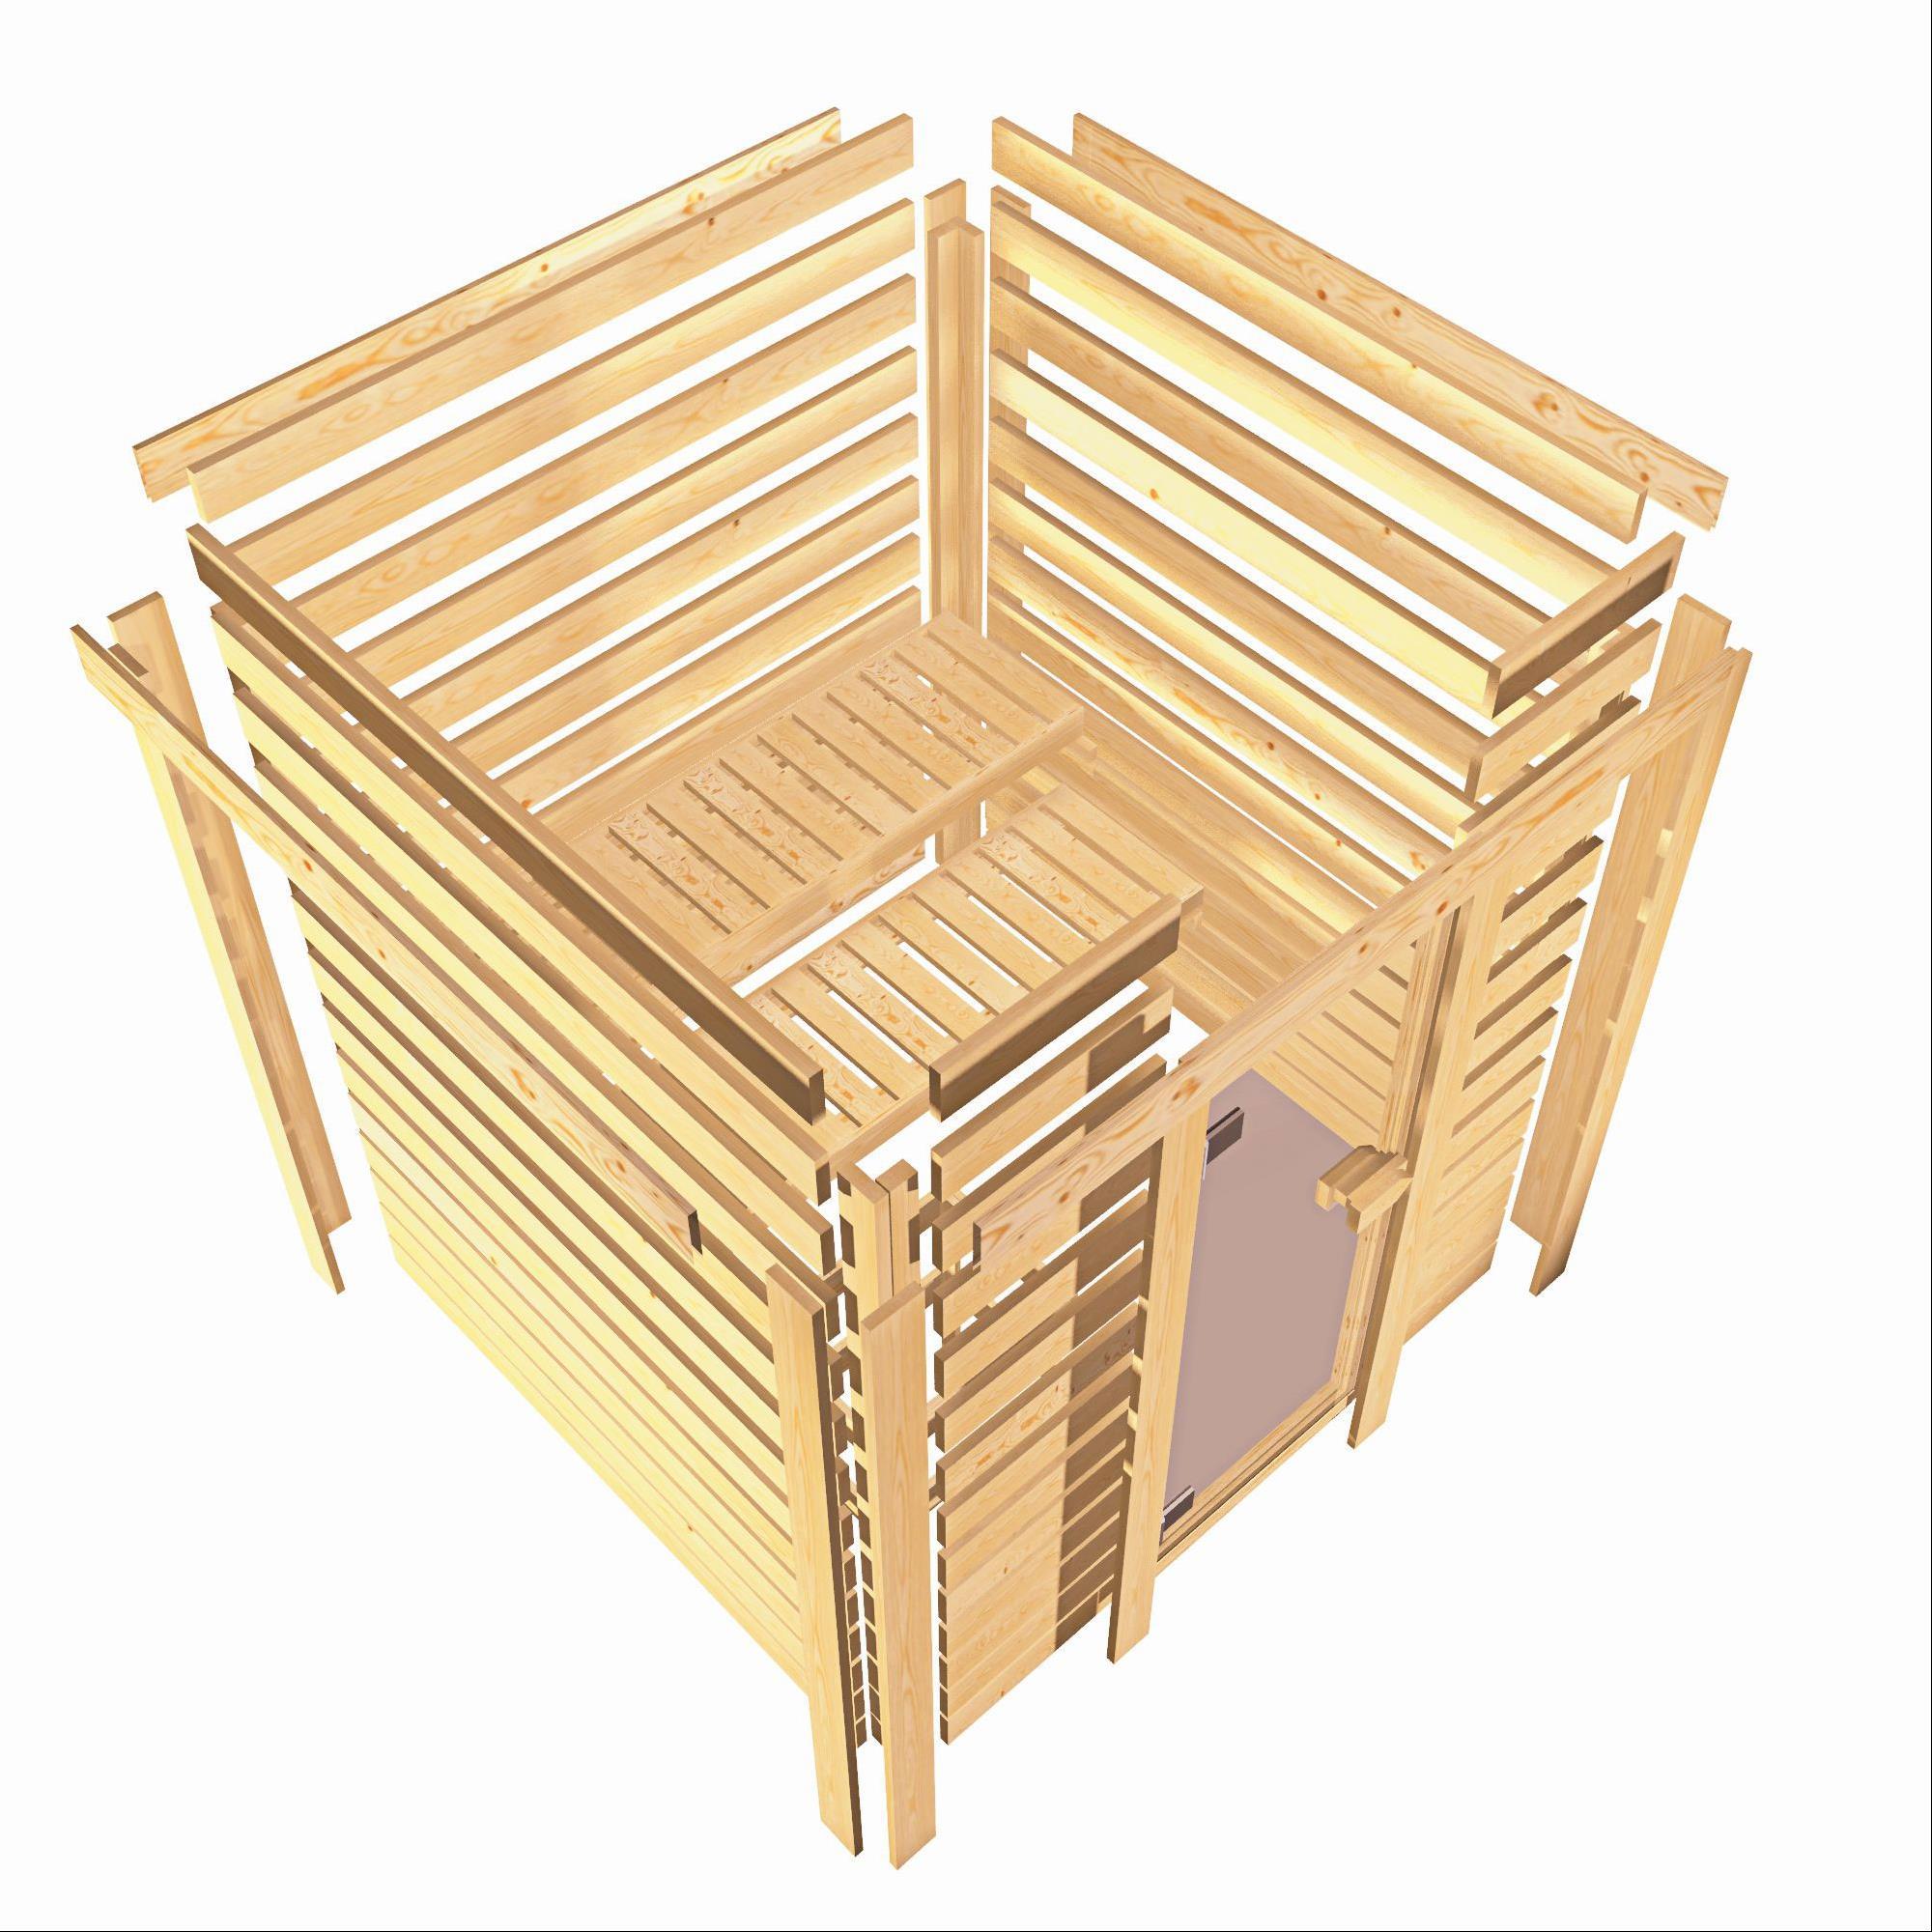 Woodfeeling Sauna Karla 38mm Kranz Ofen 9kW extern Tür Klarglas Bild 4